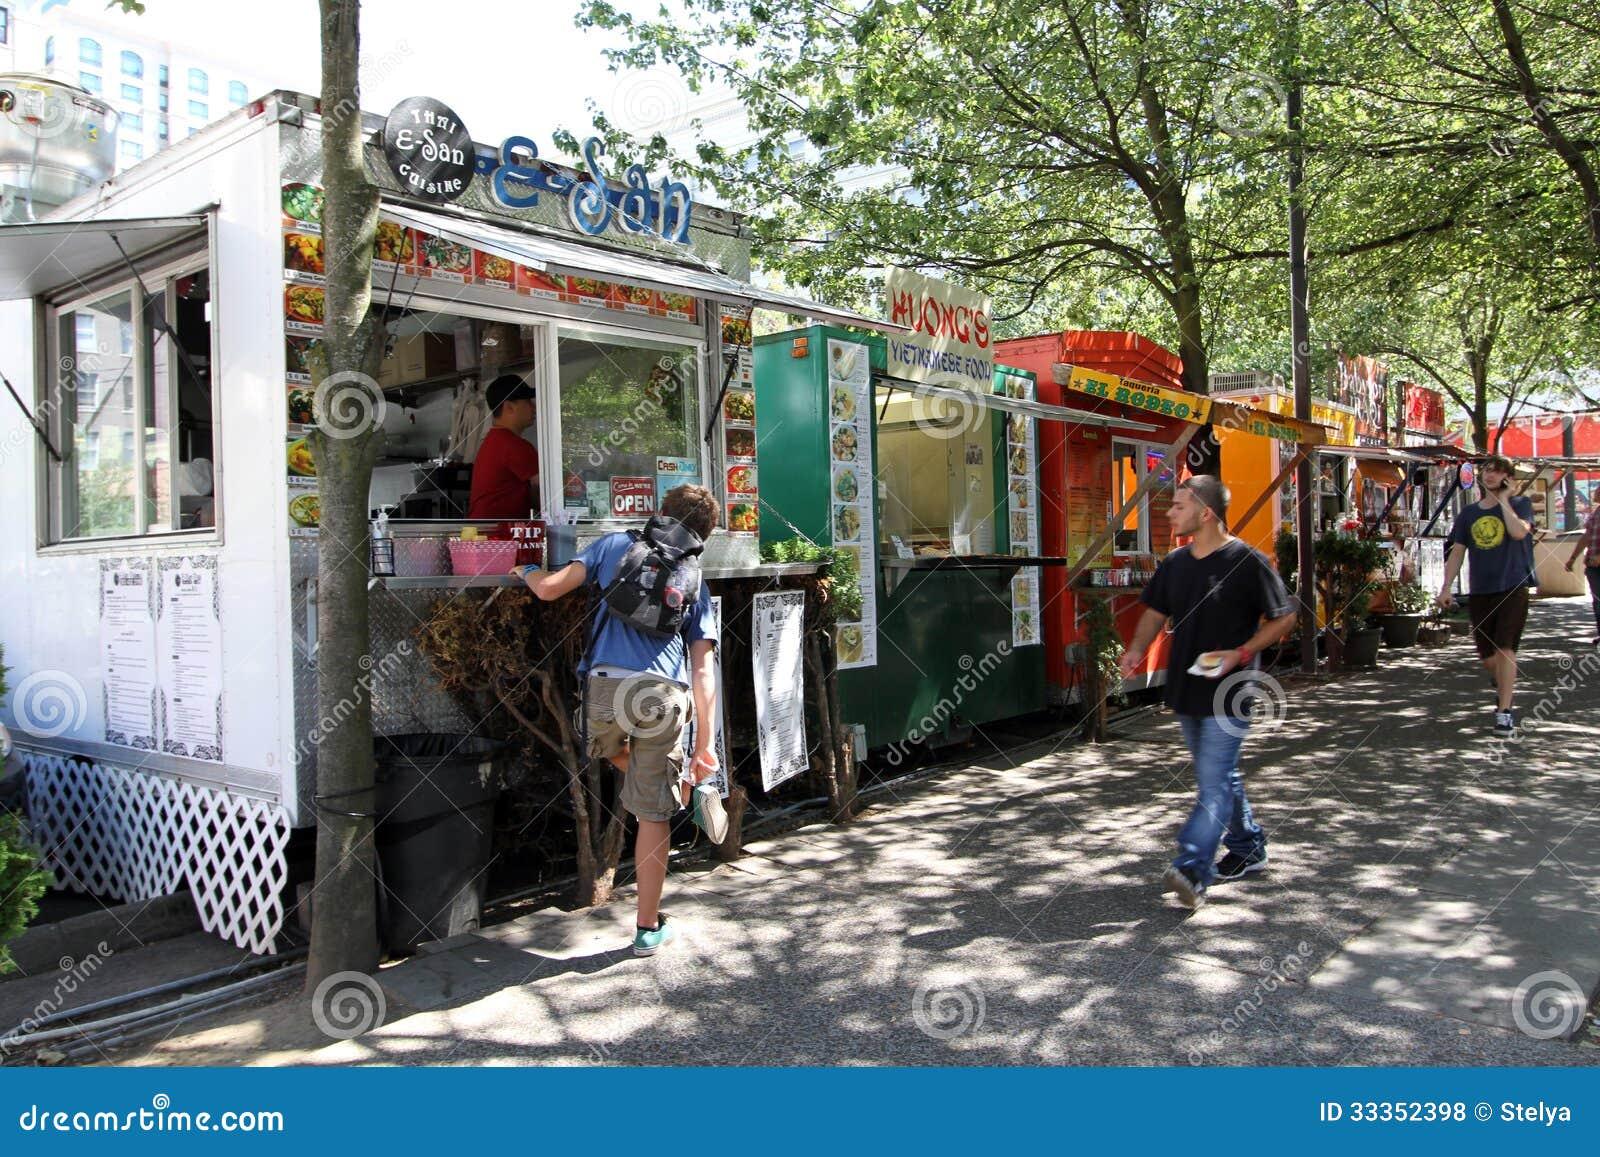 Pdx Food Truck Portland